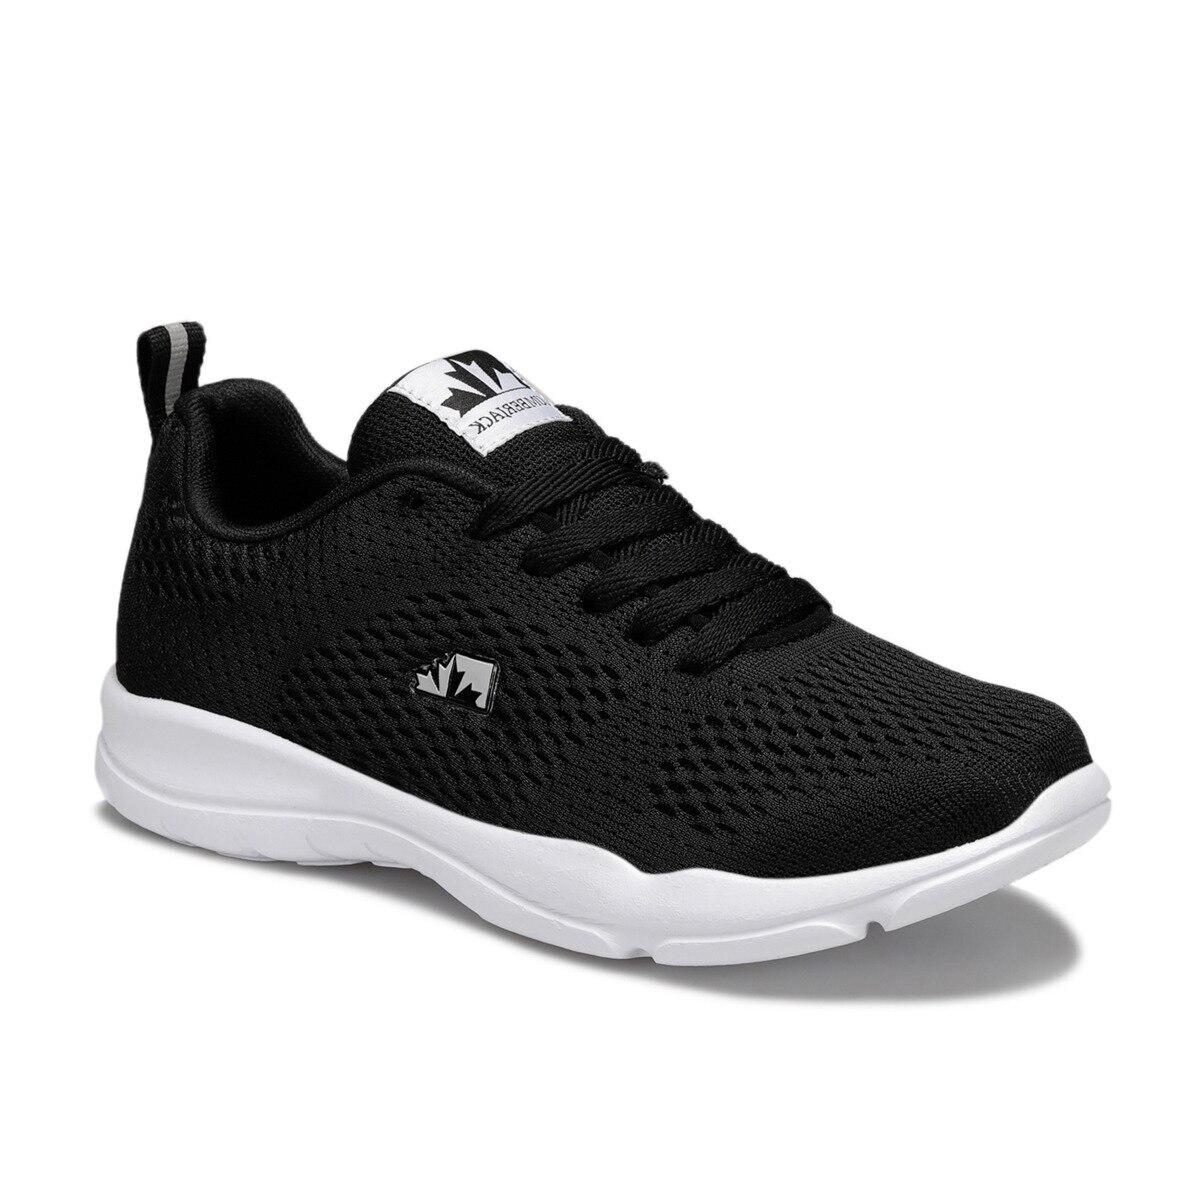 FLO AGATHA WMN Black Women Comfort Shoes LUMBERJACK